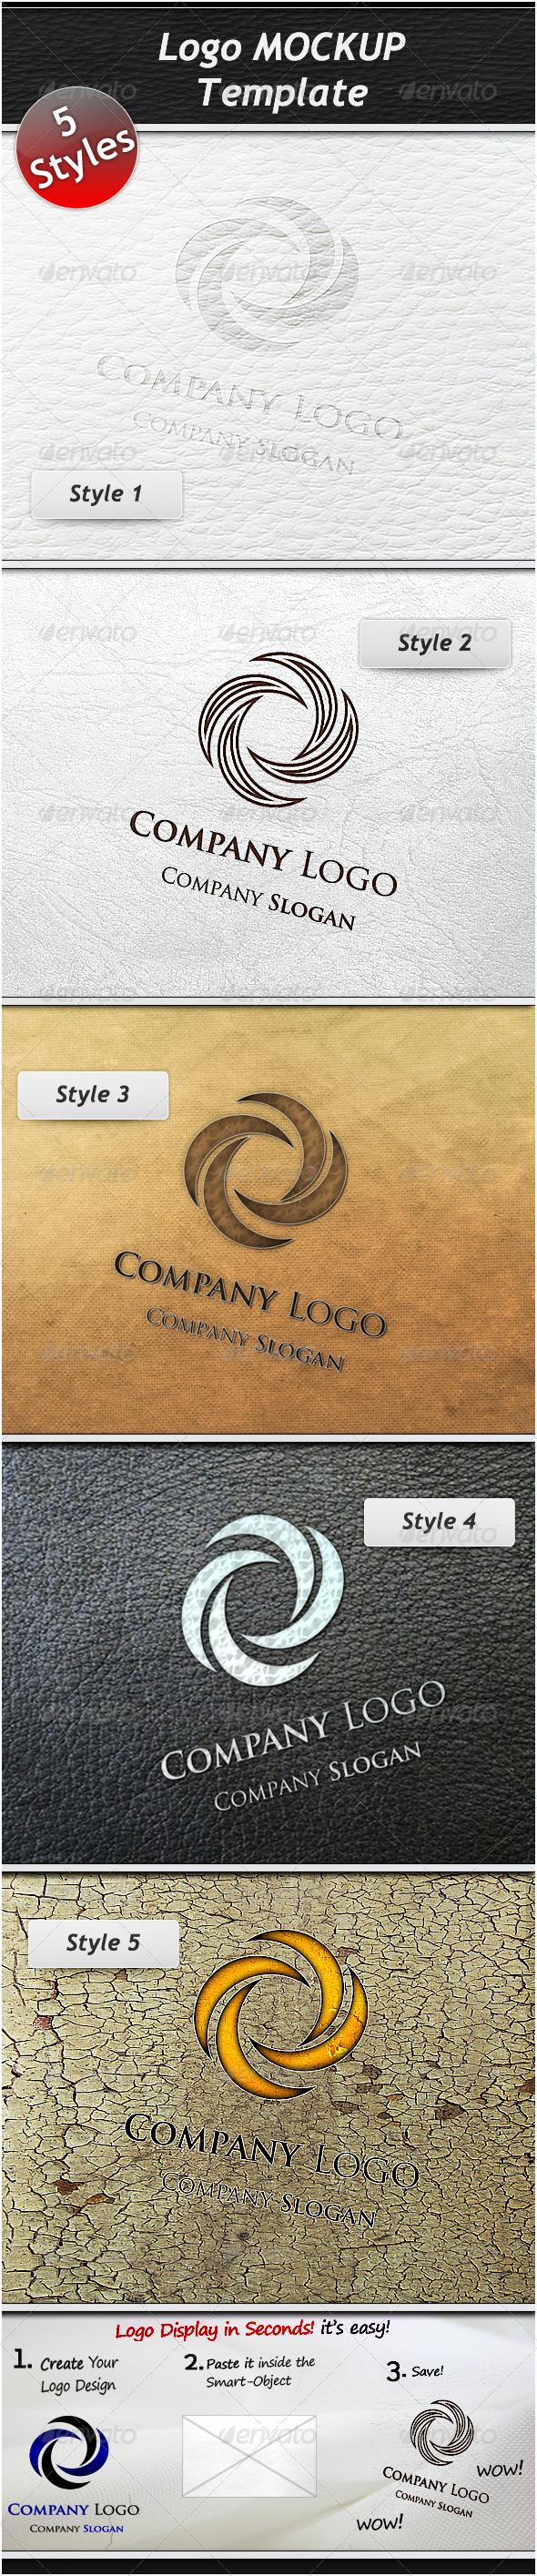 Logo Mockup Template - Logo Product Mock-Ups